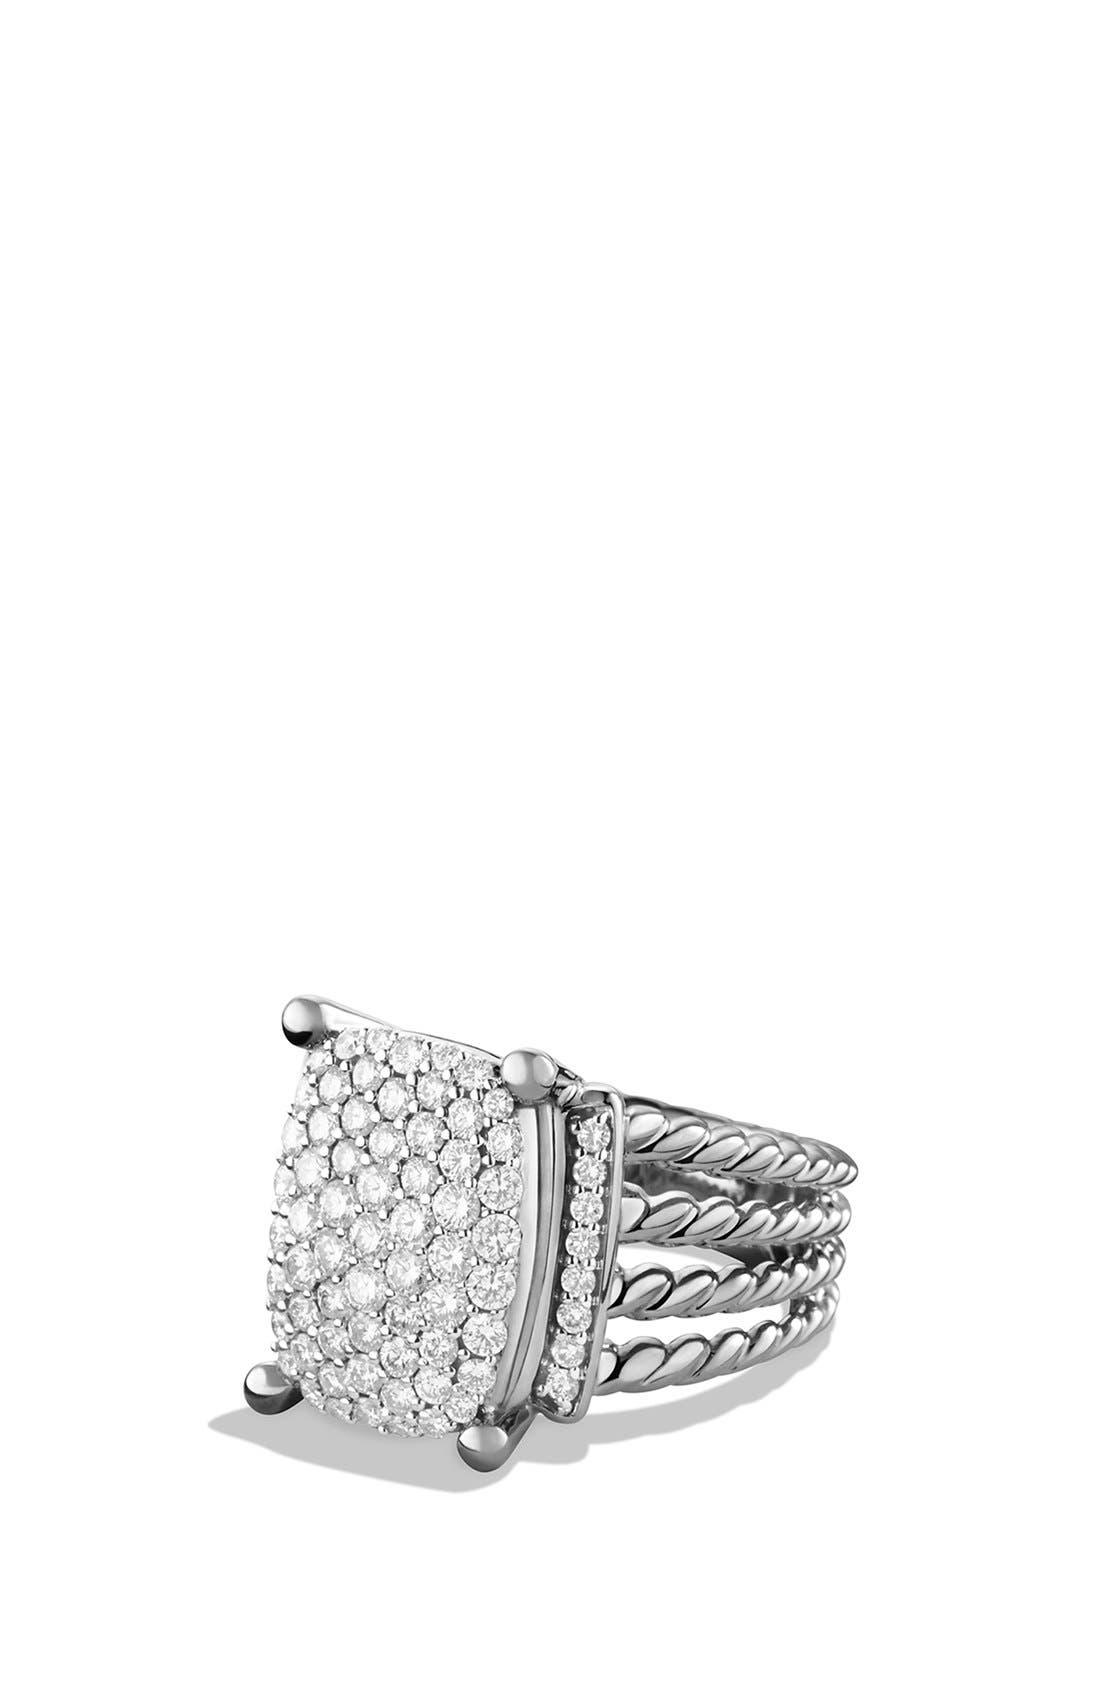 main image david yurman ring with diamonds